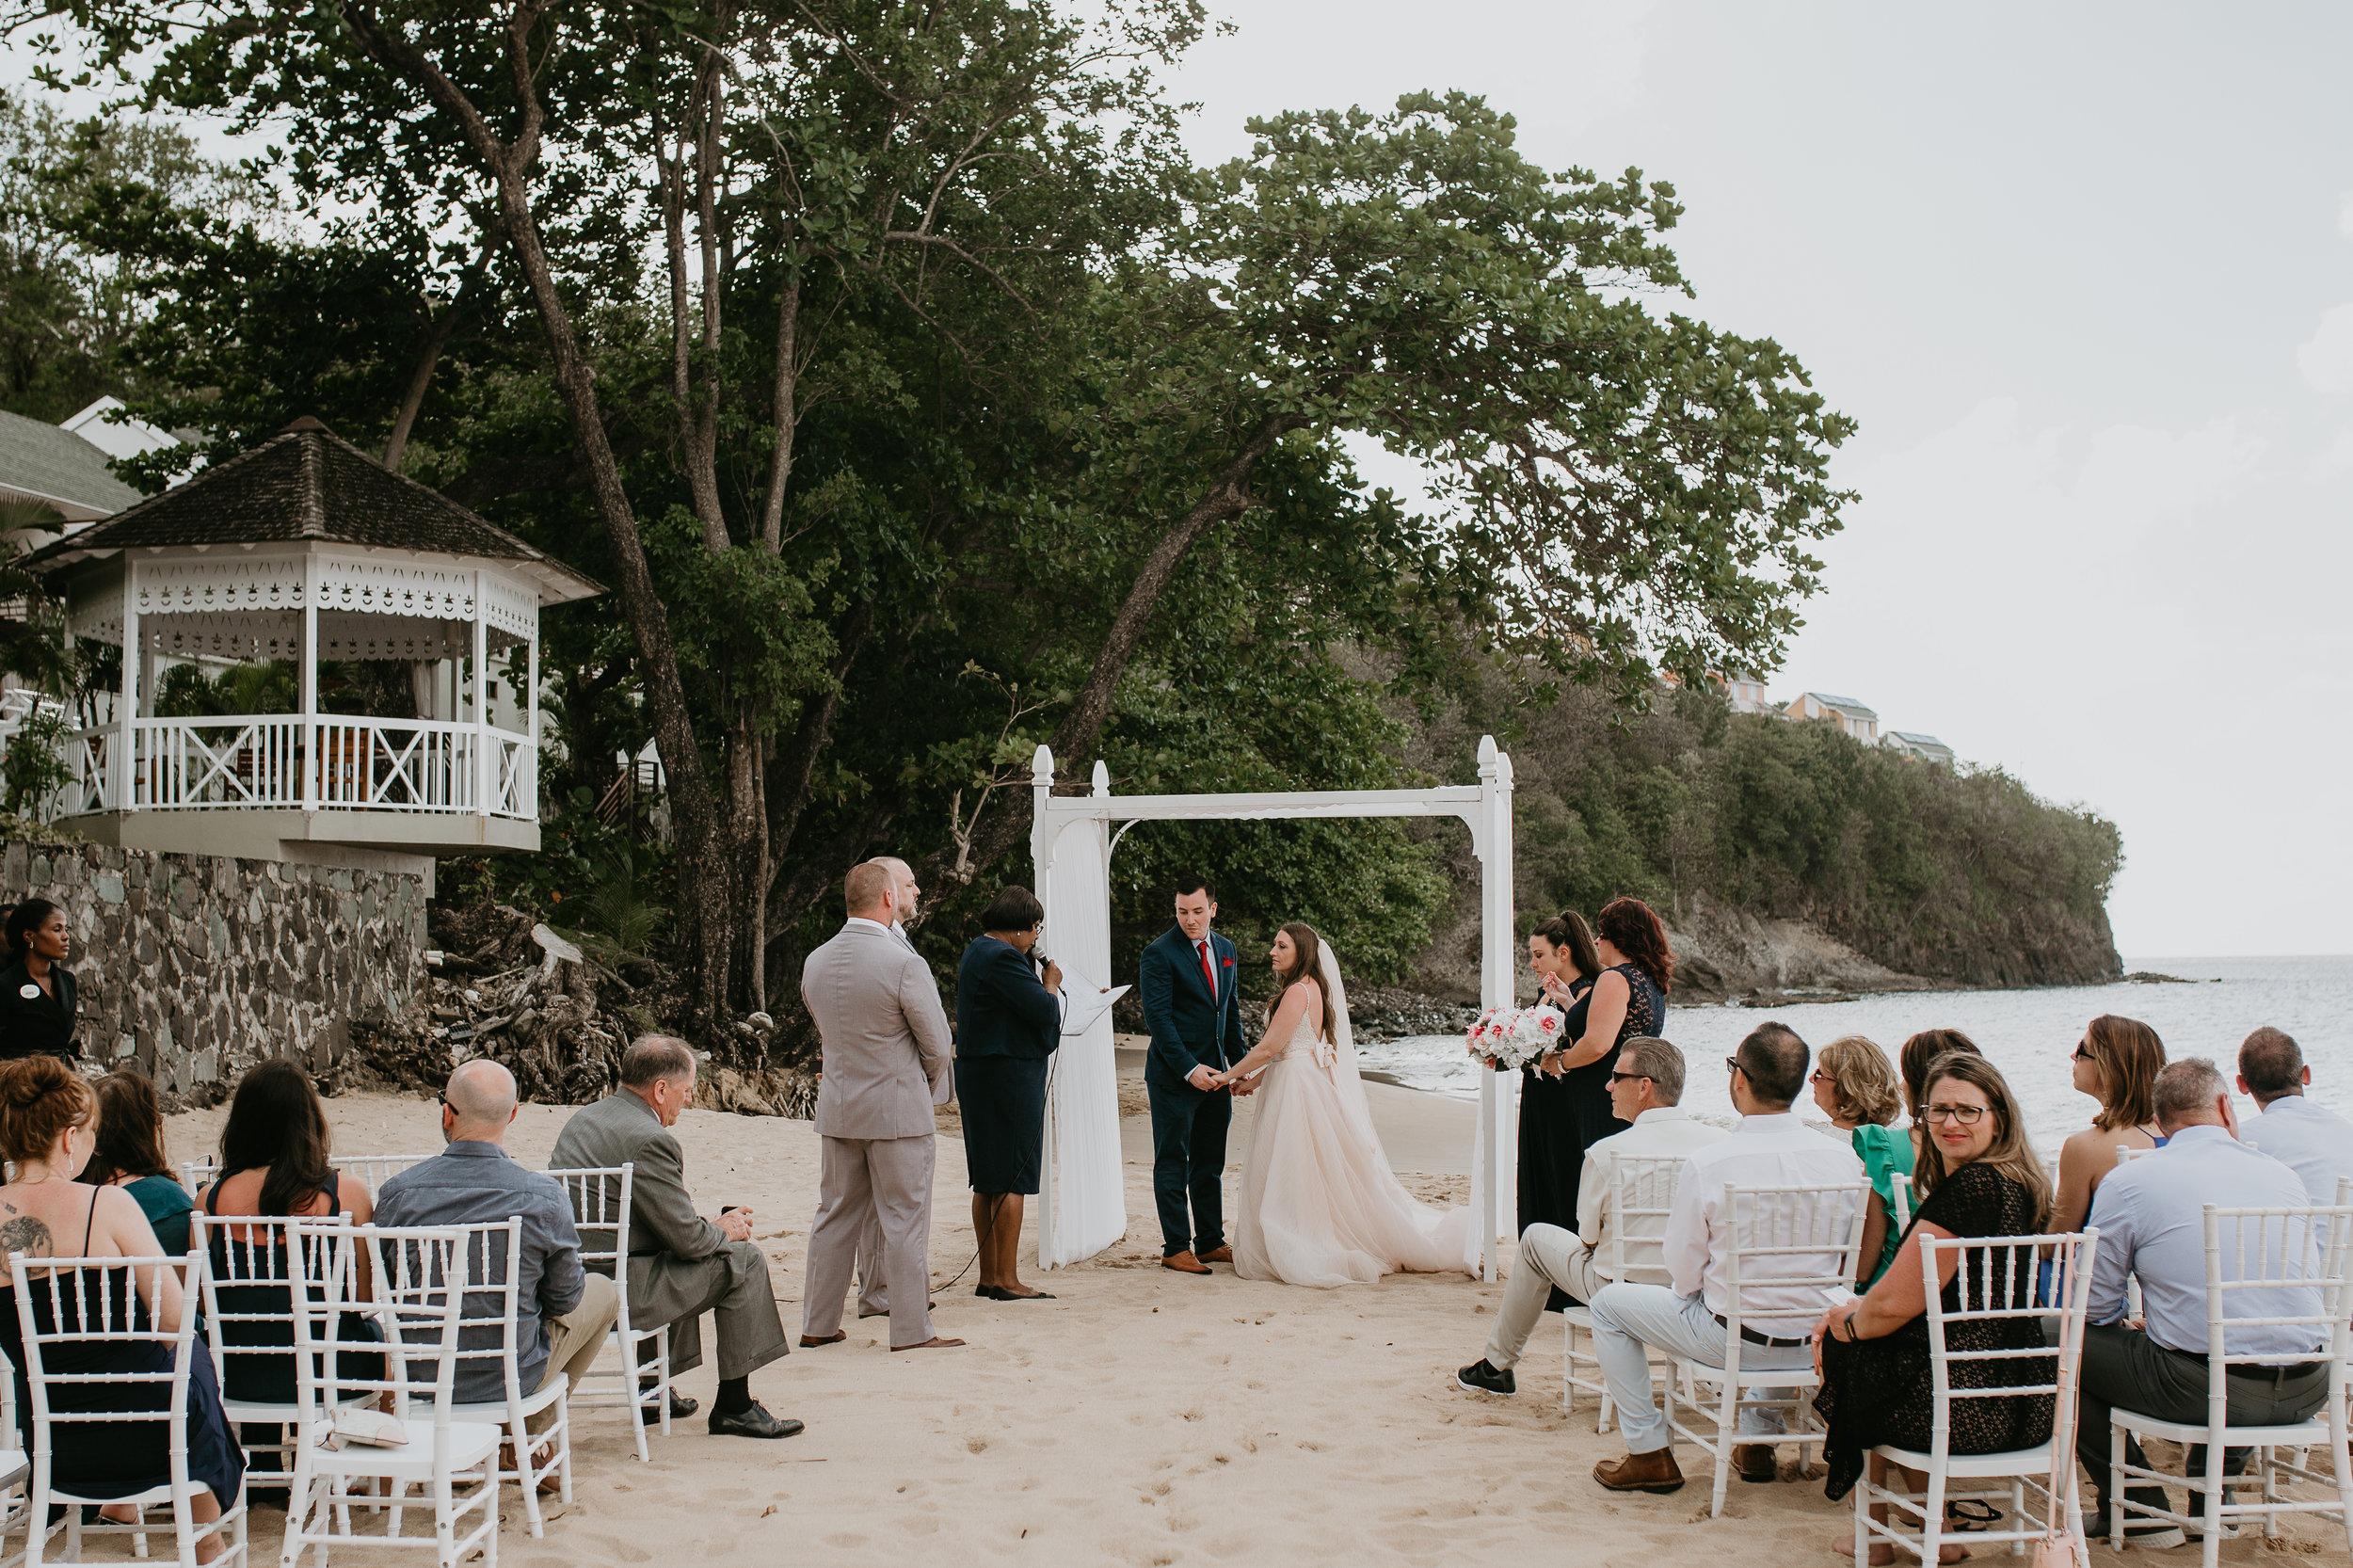 nicole-daacke-photography-destination-wedding-in-st-lucia-sandals-la-toc-intimate-island-wedding-carribean-elopement-photographer-chill-island-wedding-61.jpg